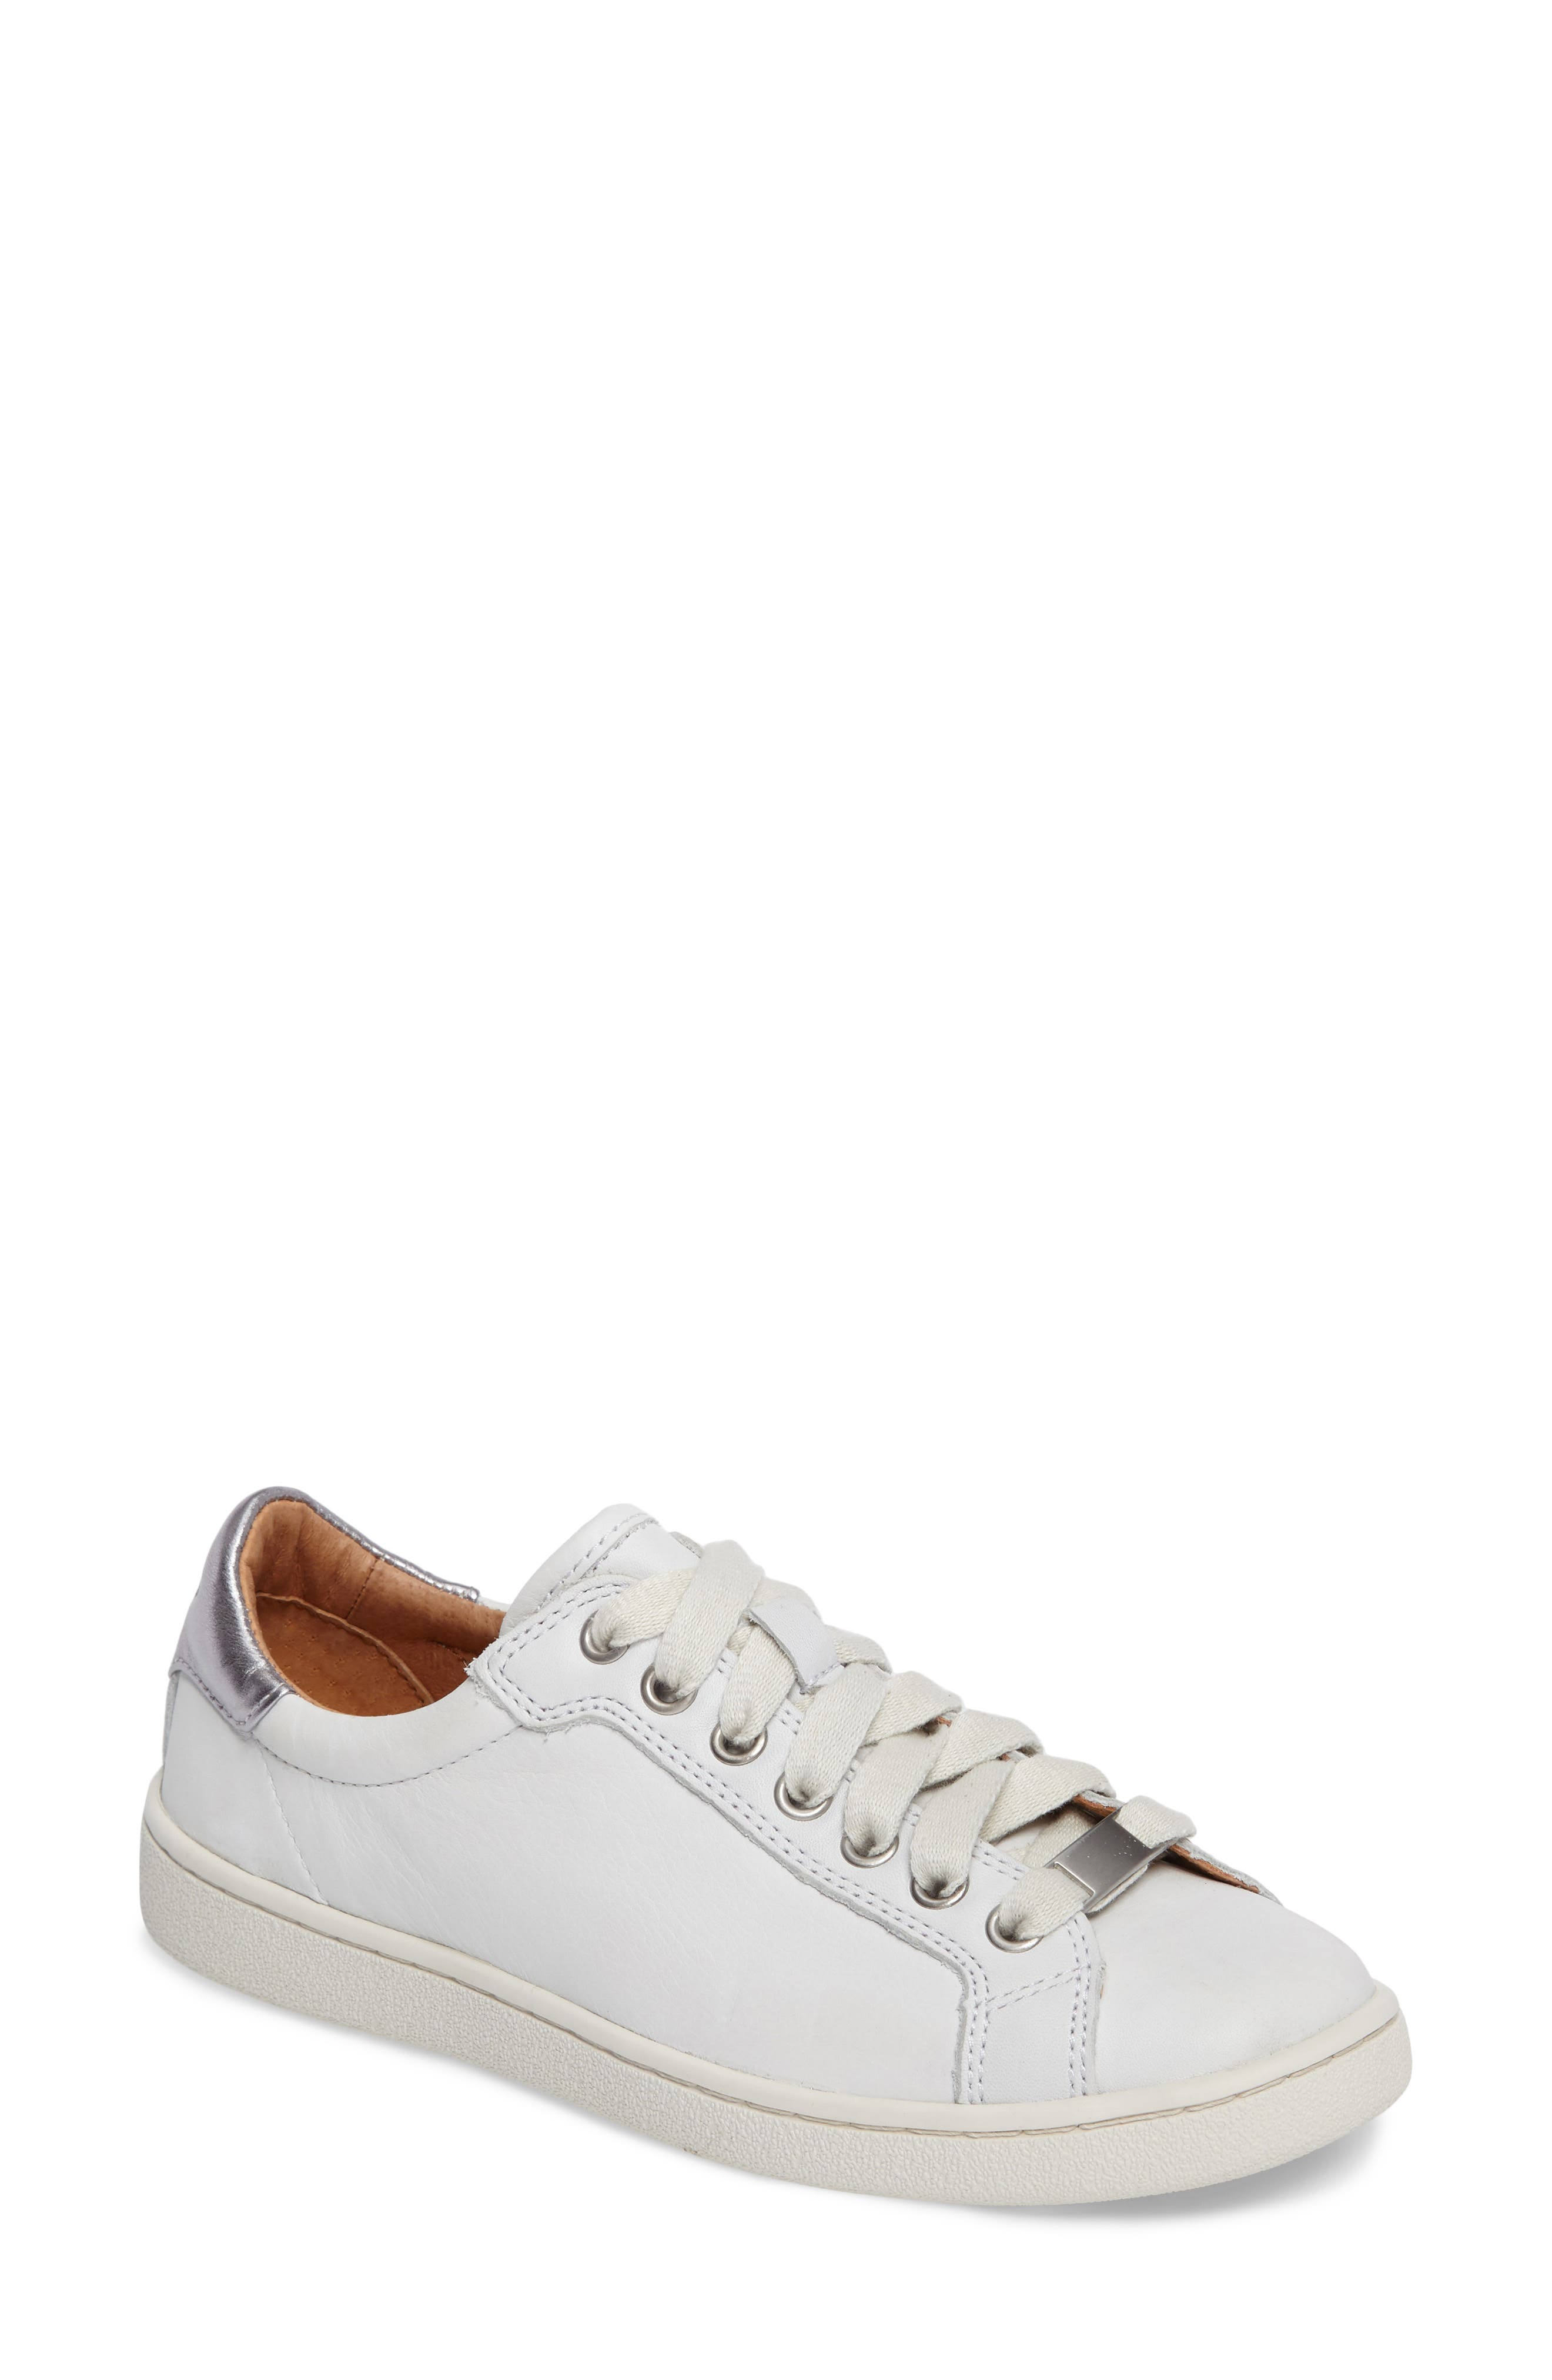 Alternate Image 1 Selected - UGG® Milo Sneaker (Women)